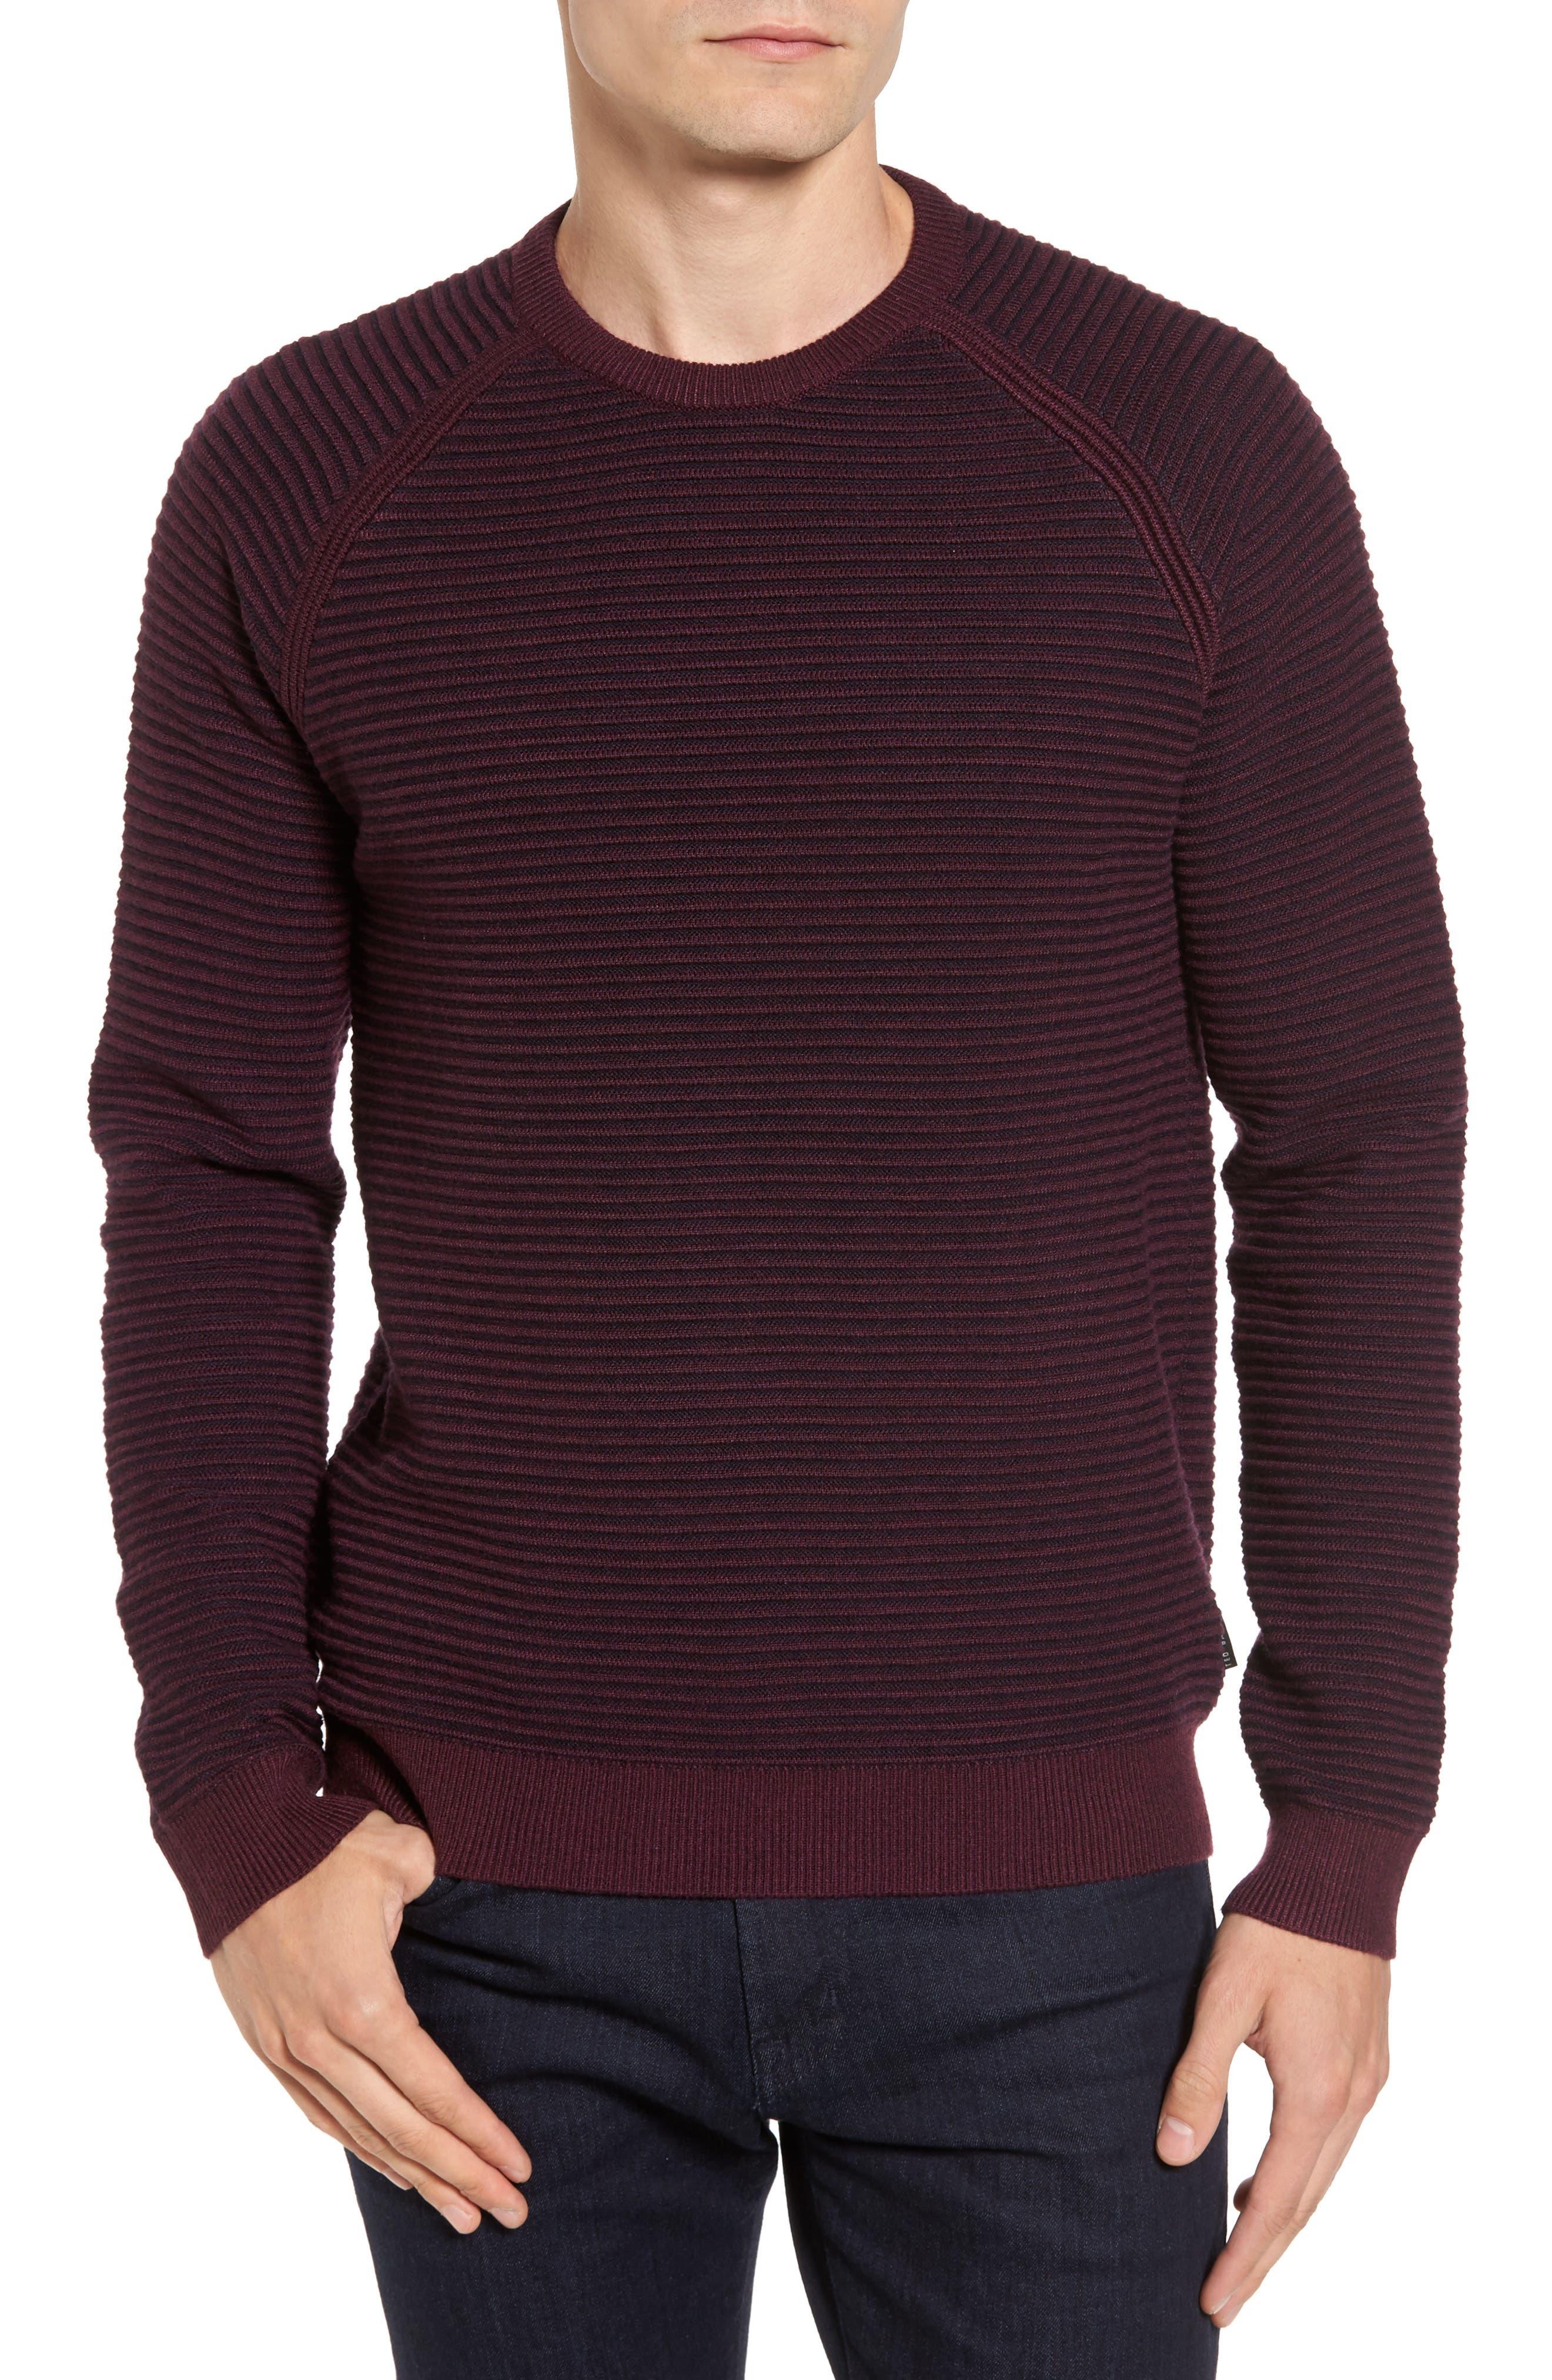 Cashoo Slim Fit Ribbed Sweatshirt,                             Main thumbnail 1, color,                             Purple